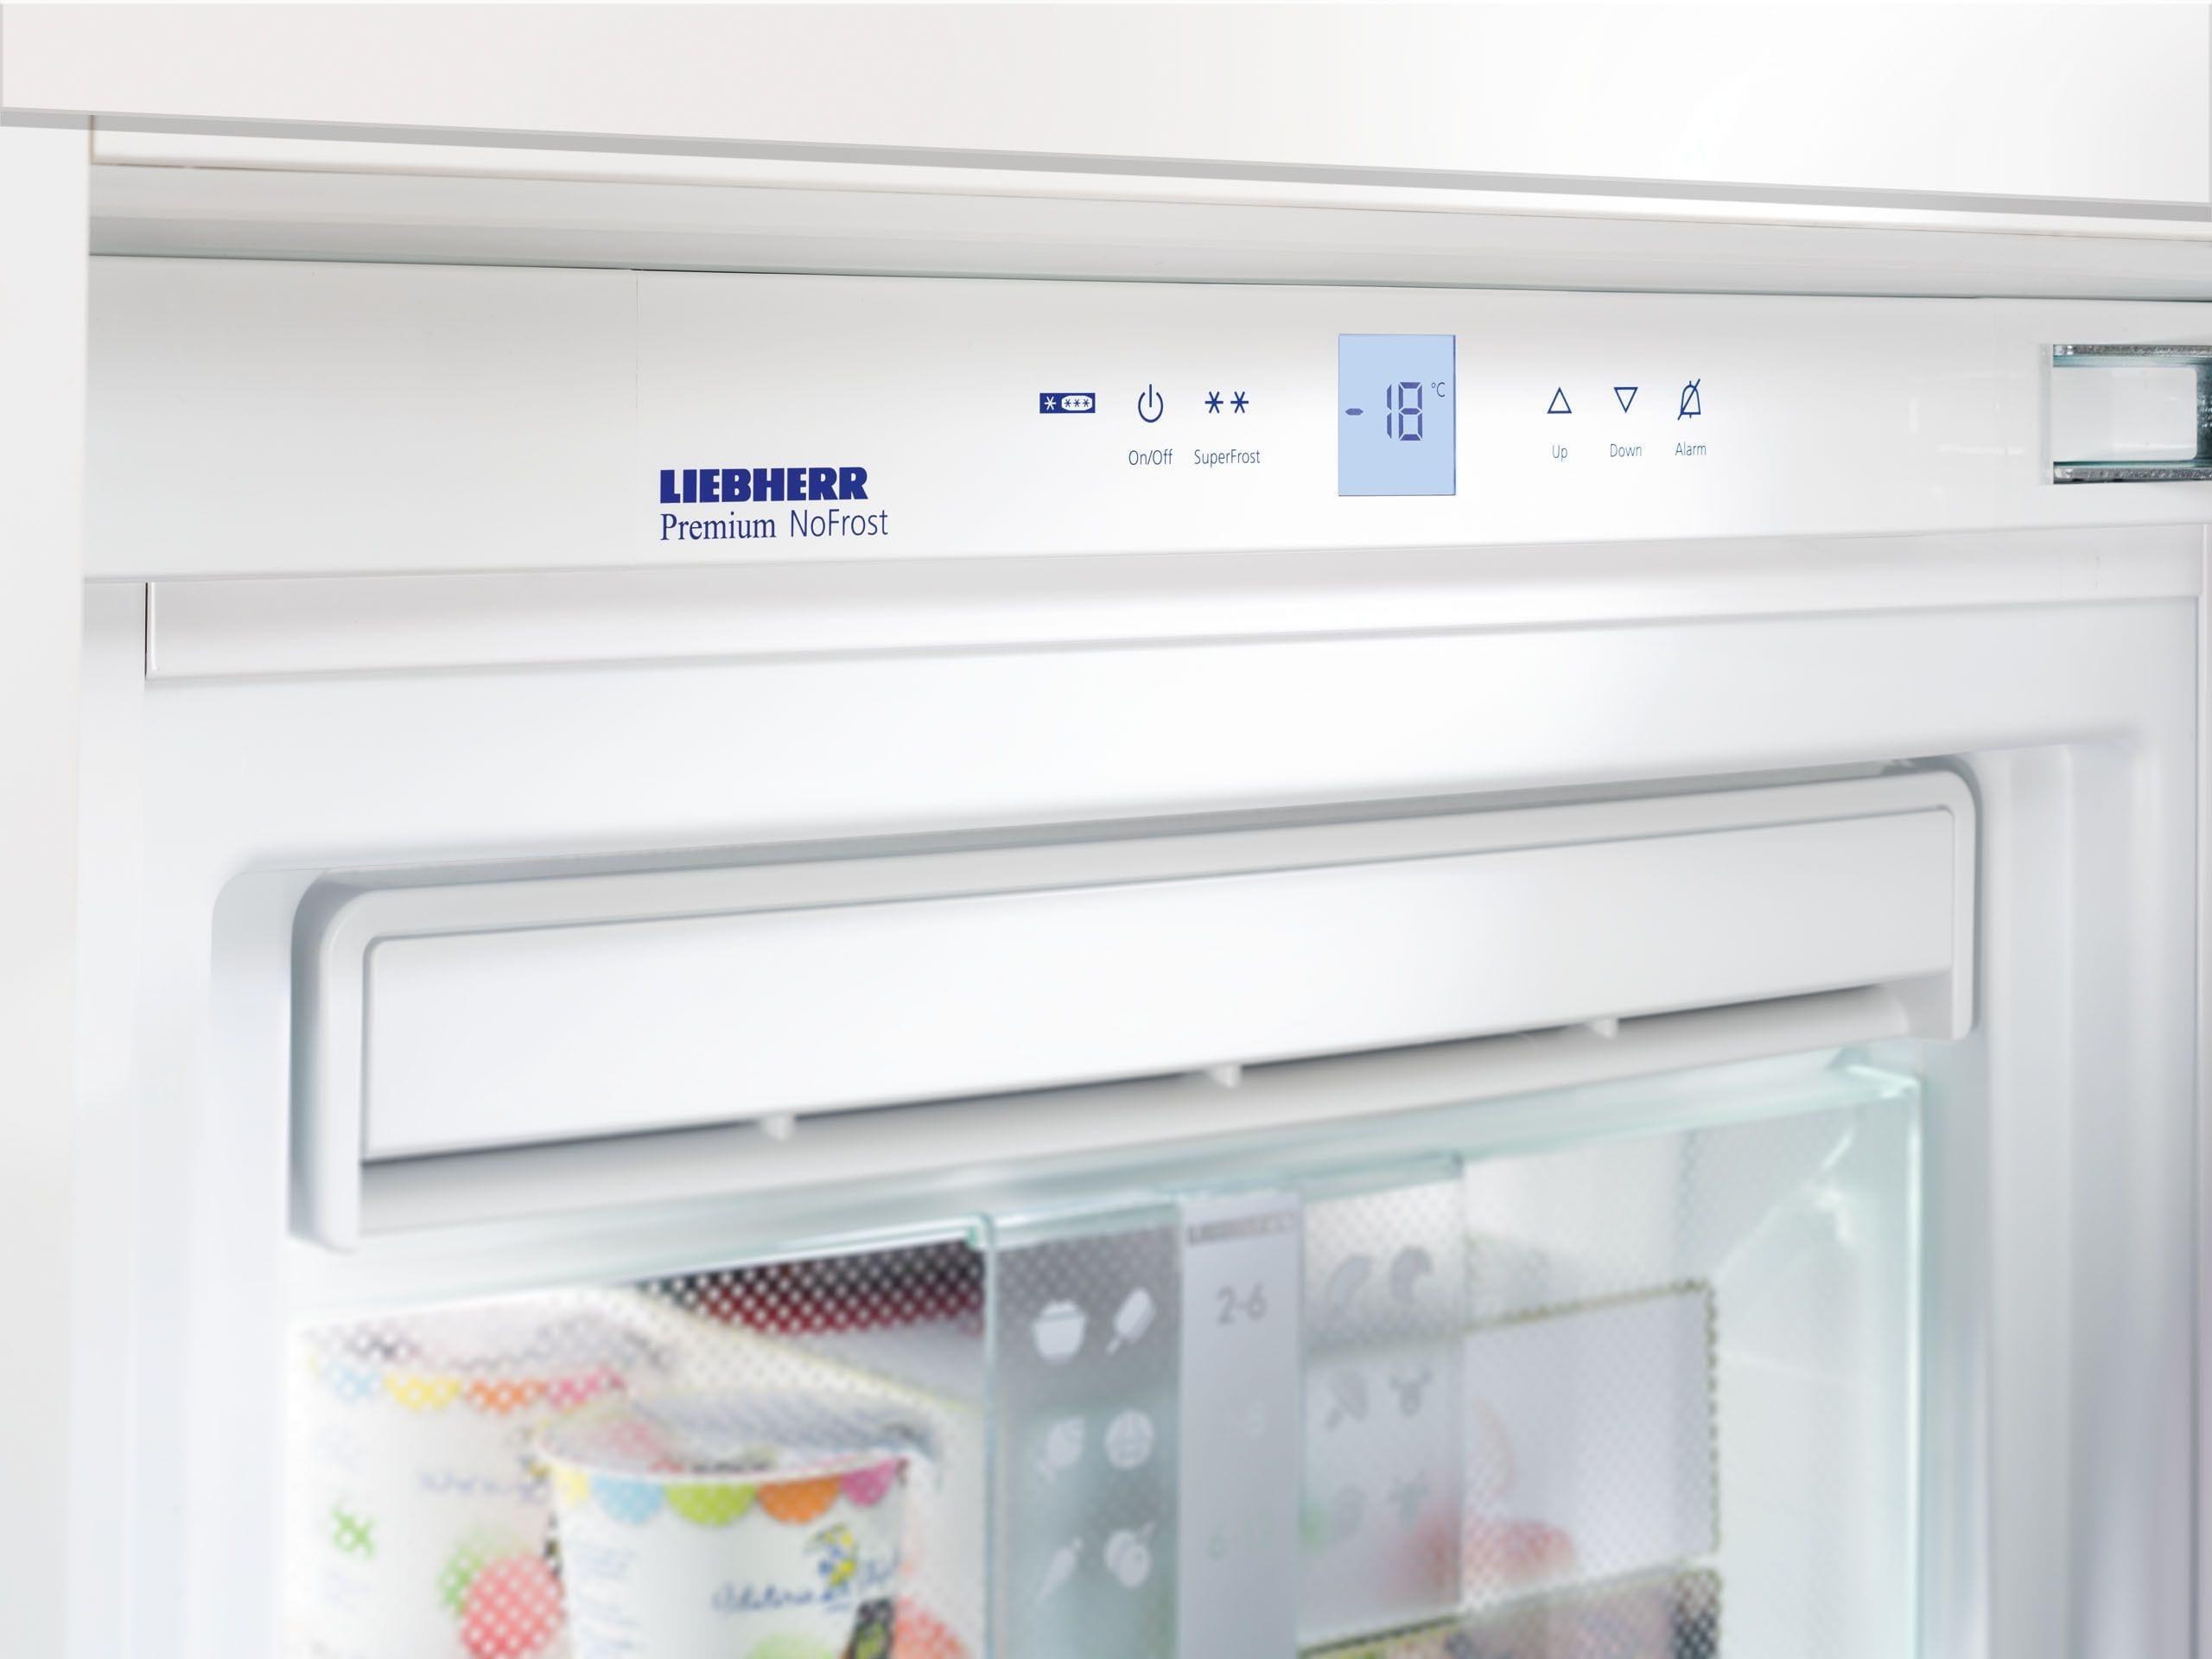 perch la temperatura ideale del congelatore 18 c freshmag. Black Bedroom Furniture Sets. Home Design Ideas